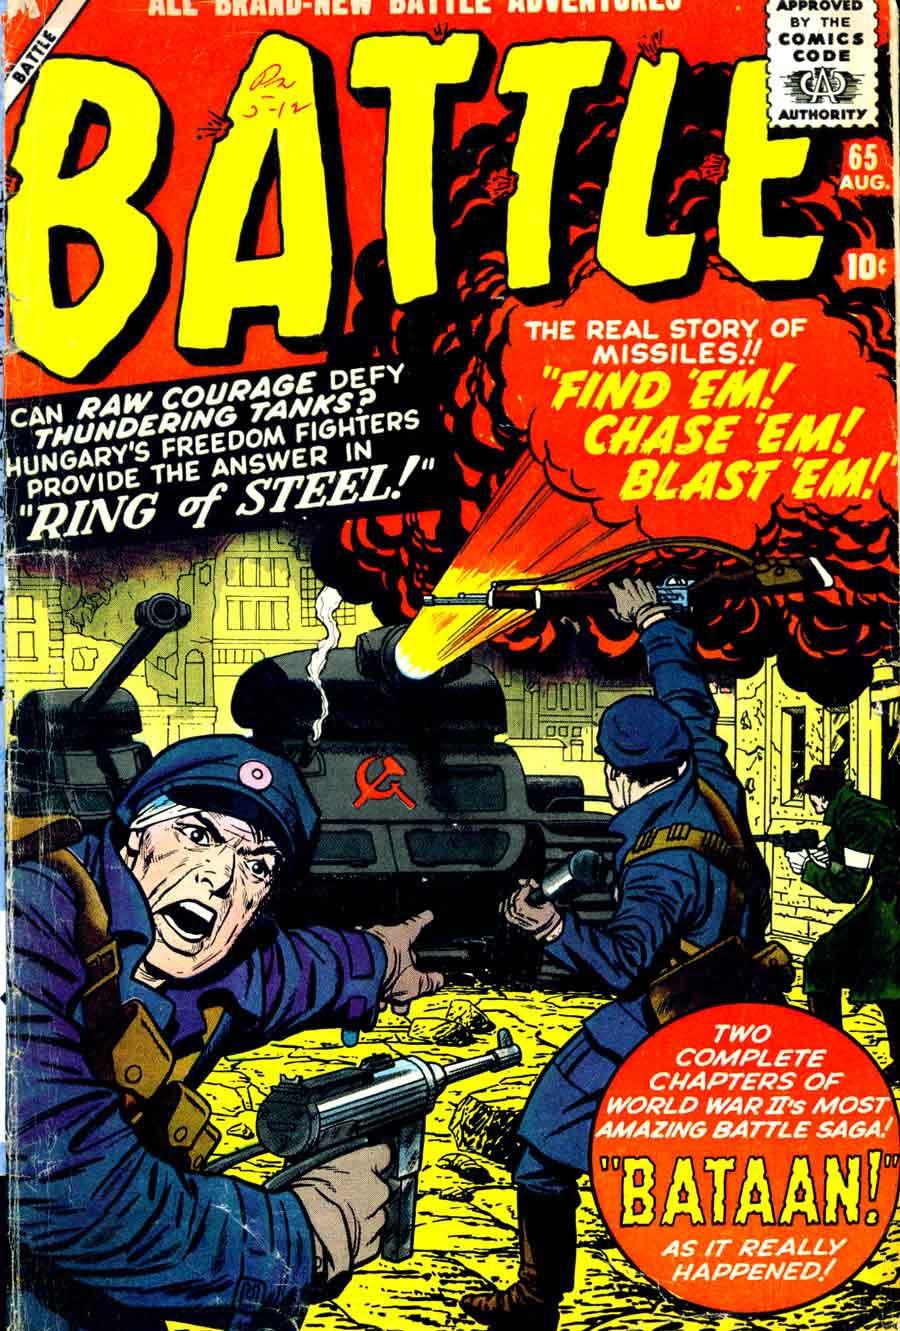 Jack Kirby silver age 1950s atlas war comic book cover - Battle #65